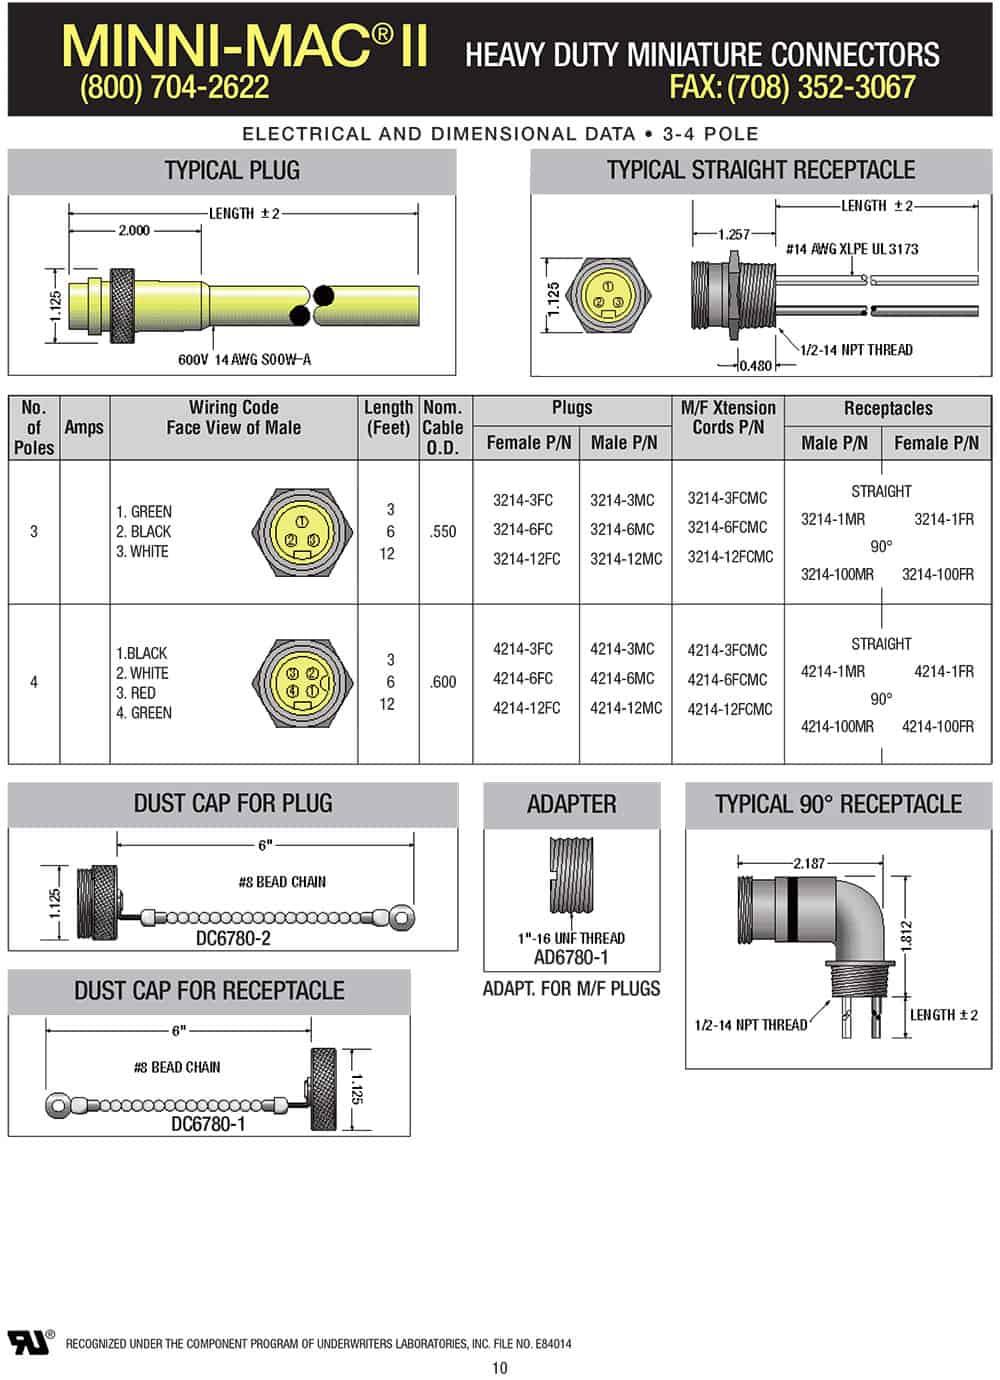 Minni Mac II 3-4 pole connectors spec sheet